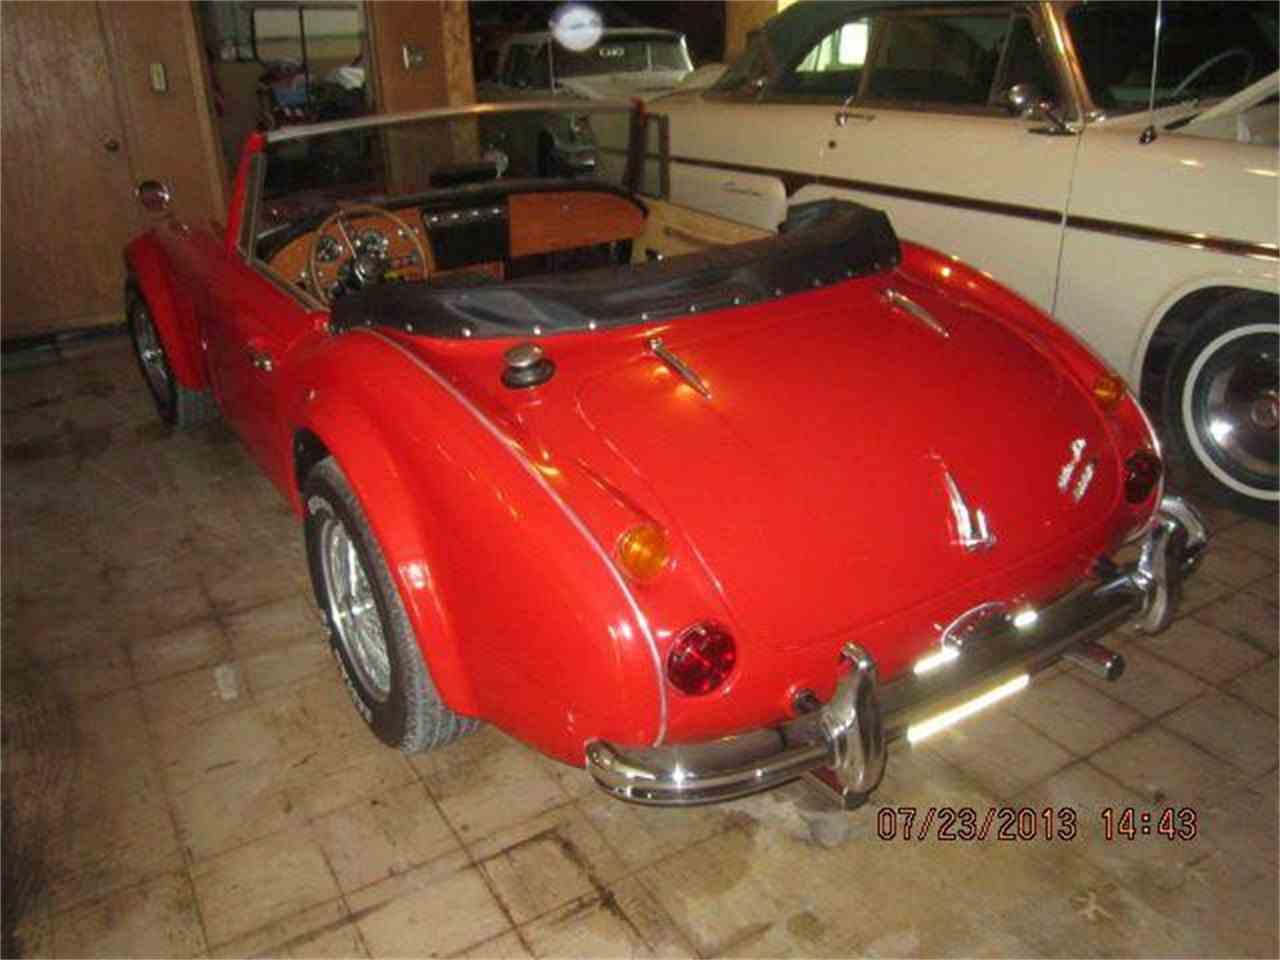 1967 Austin Healey 3000 Sebring Kit Car for Sale | ClassicCars.com ...